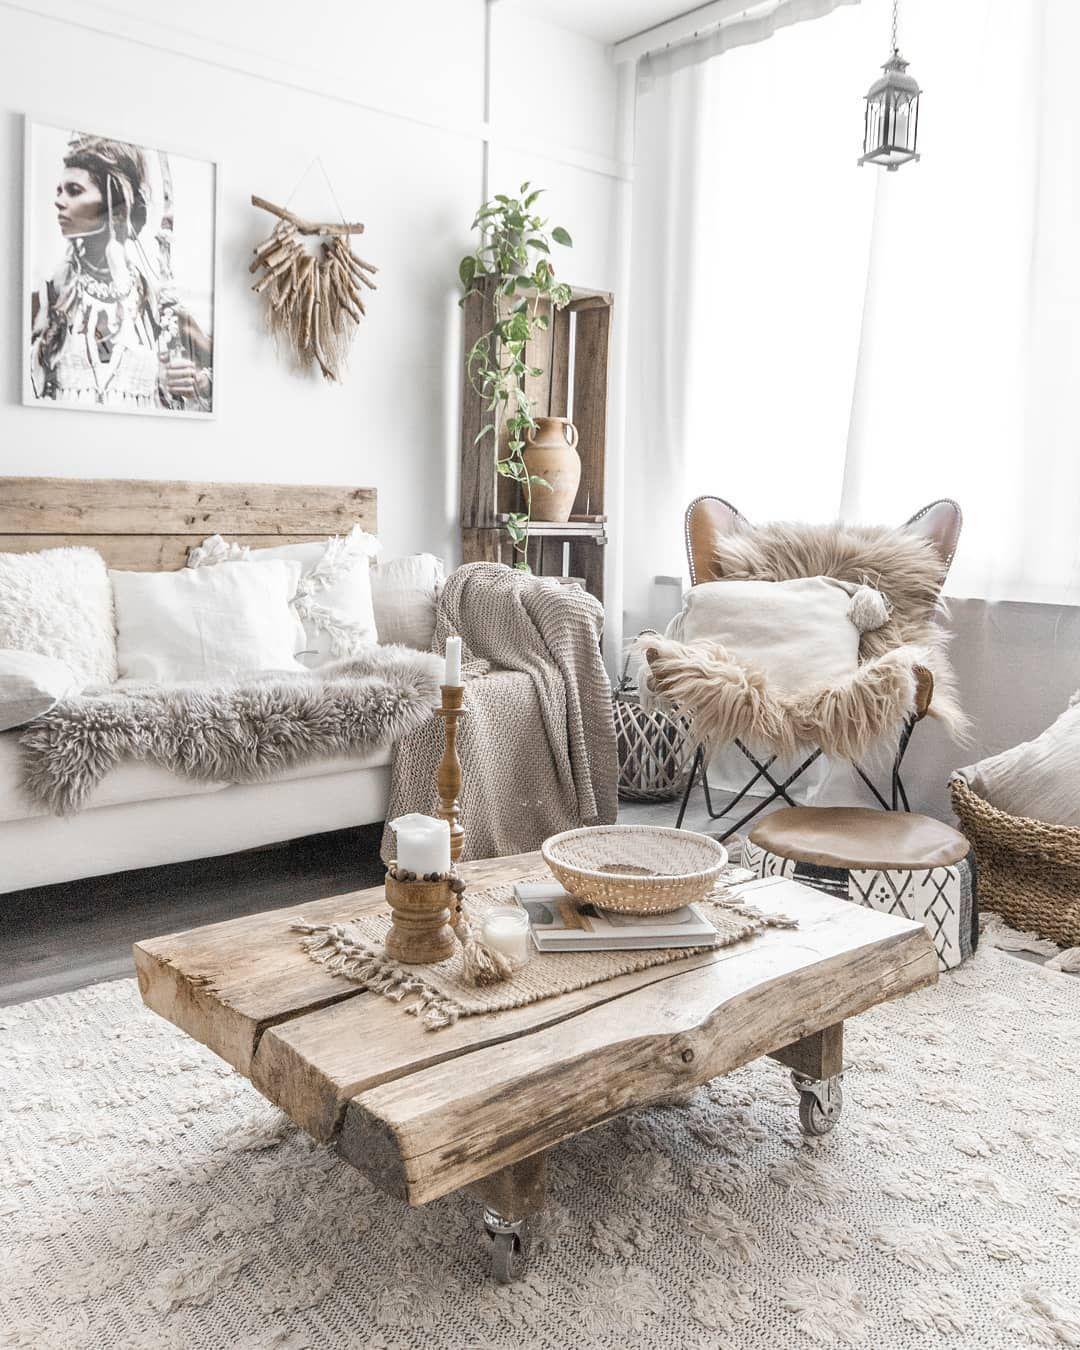 Instagram In 2020 Rustic Chic Living Room Boho Living Room